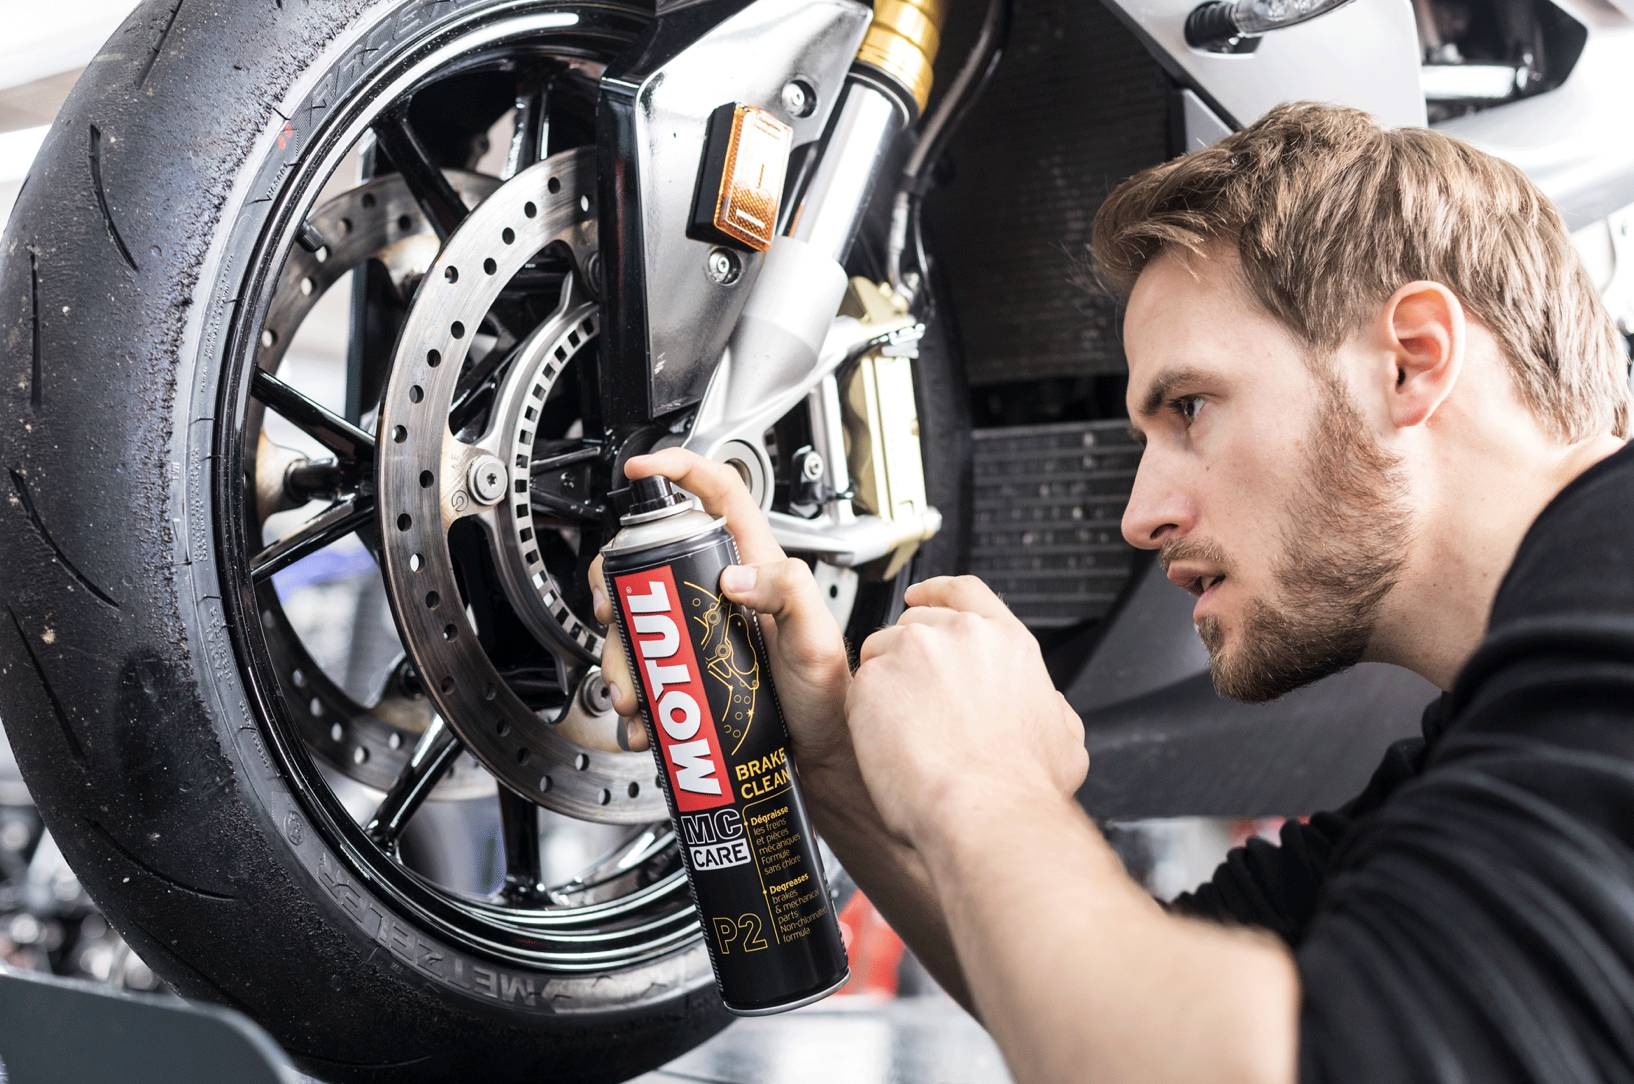 P2 Brake Clean Contact